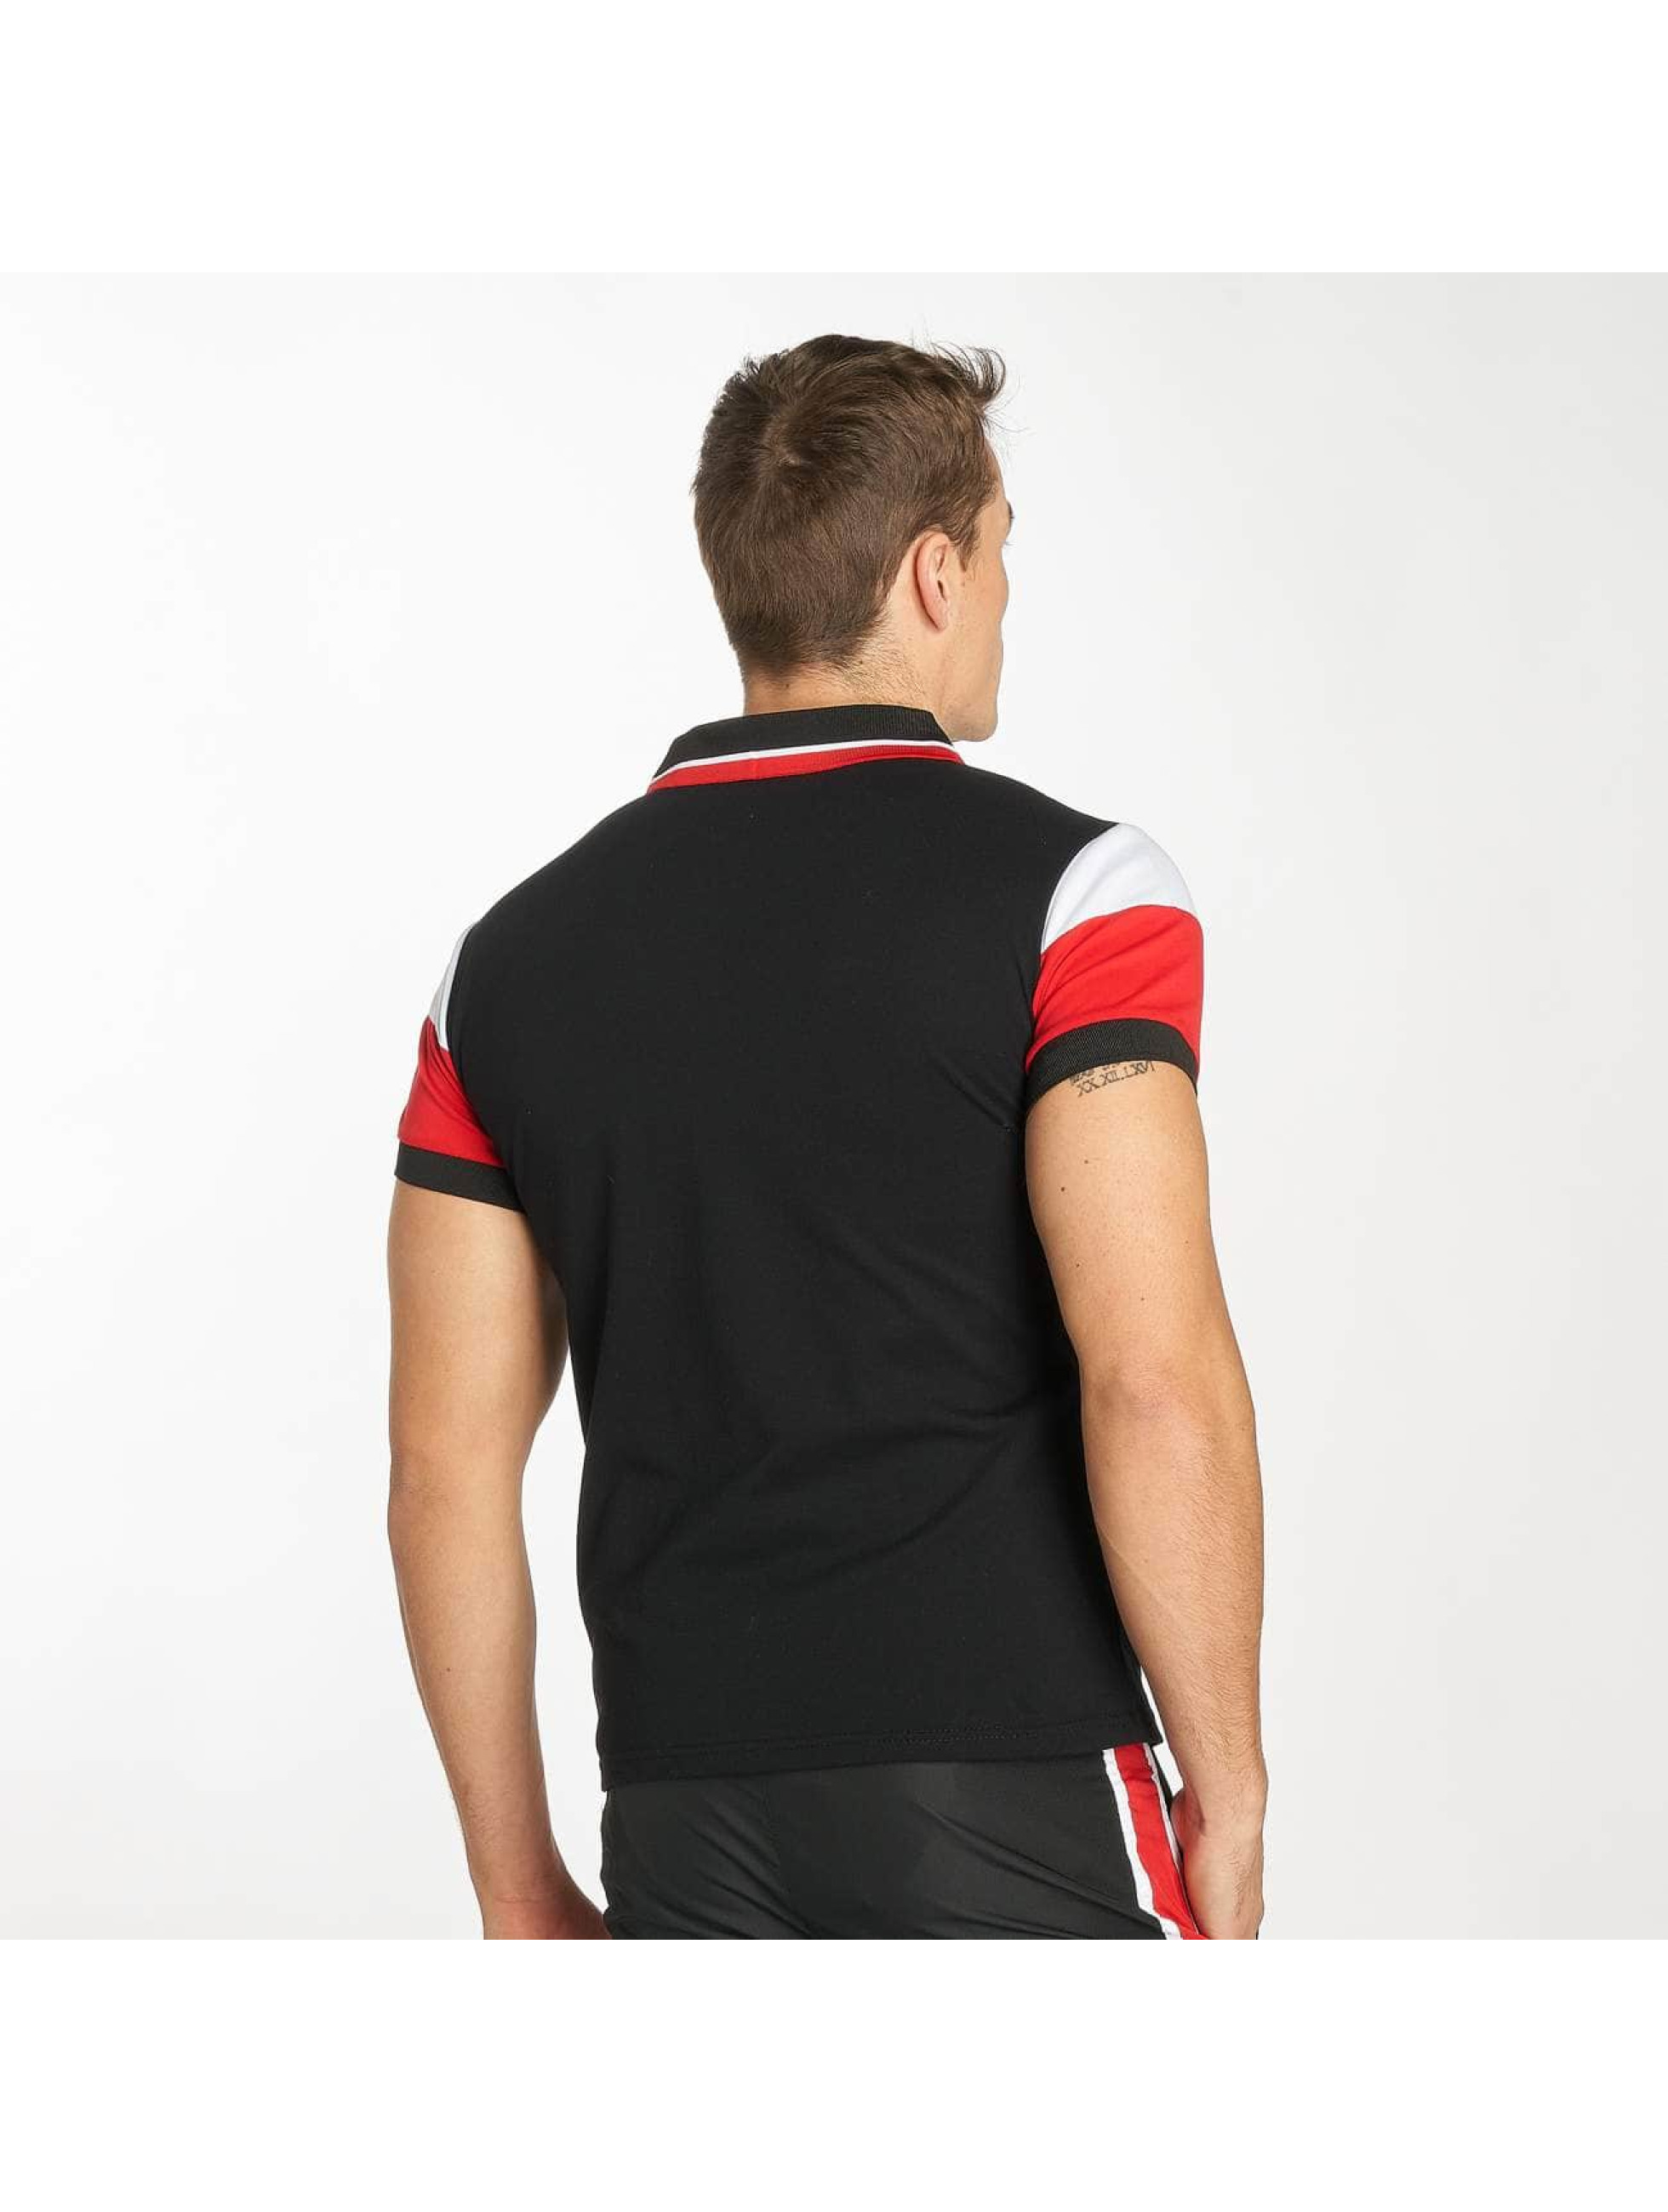 Zayne Paris Koszulki Polo Stripe czarny